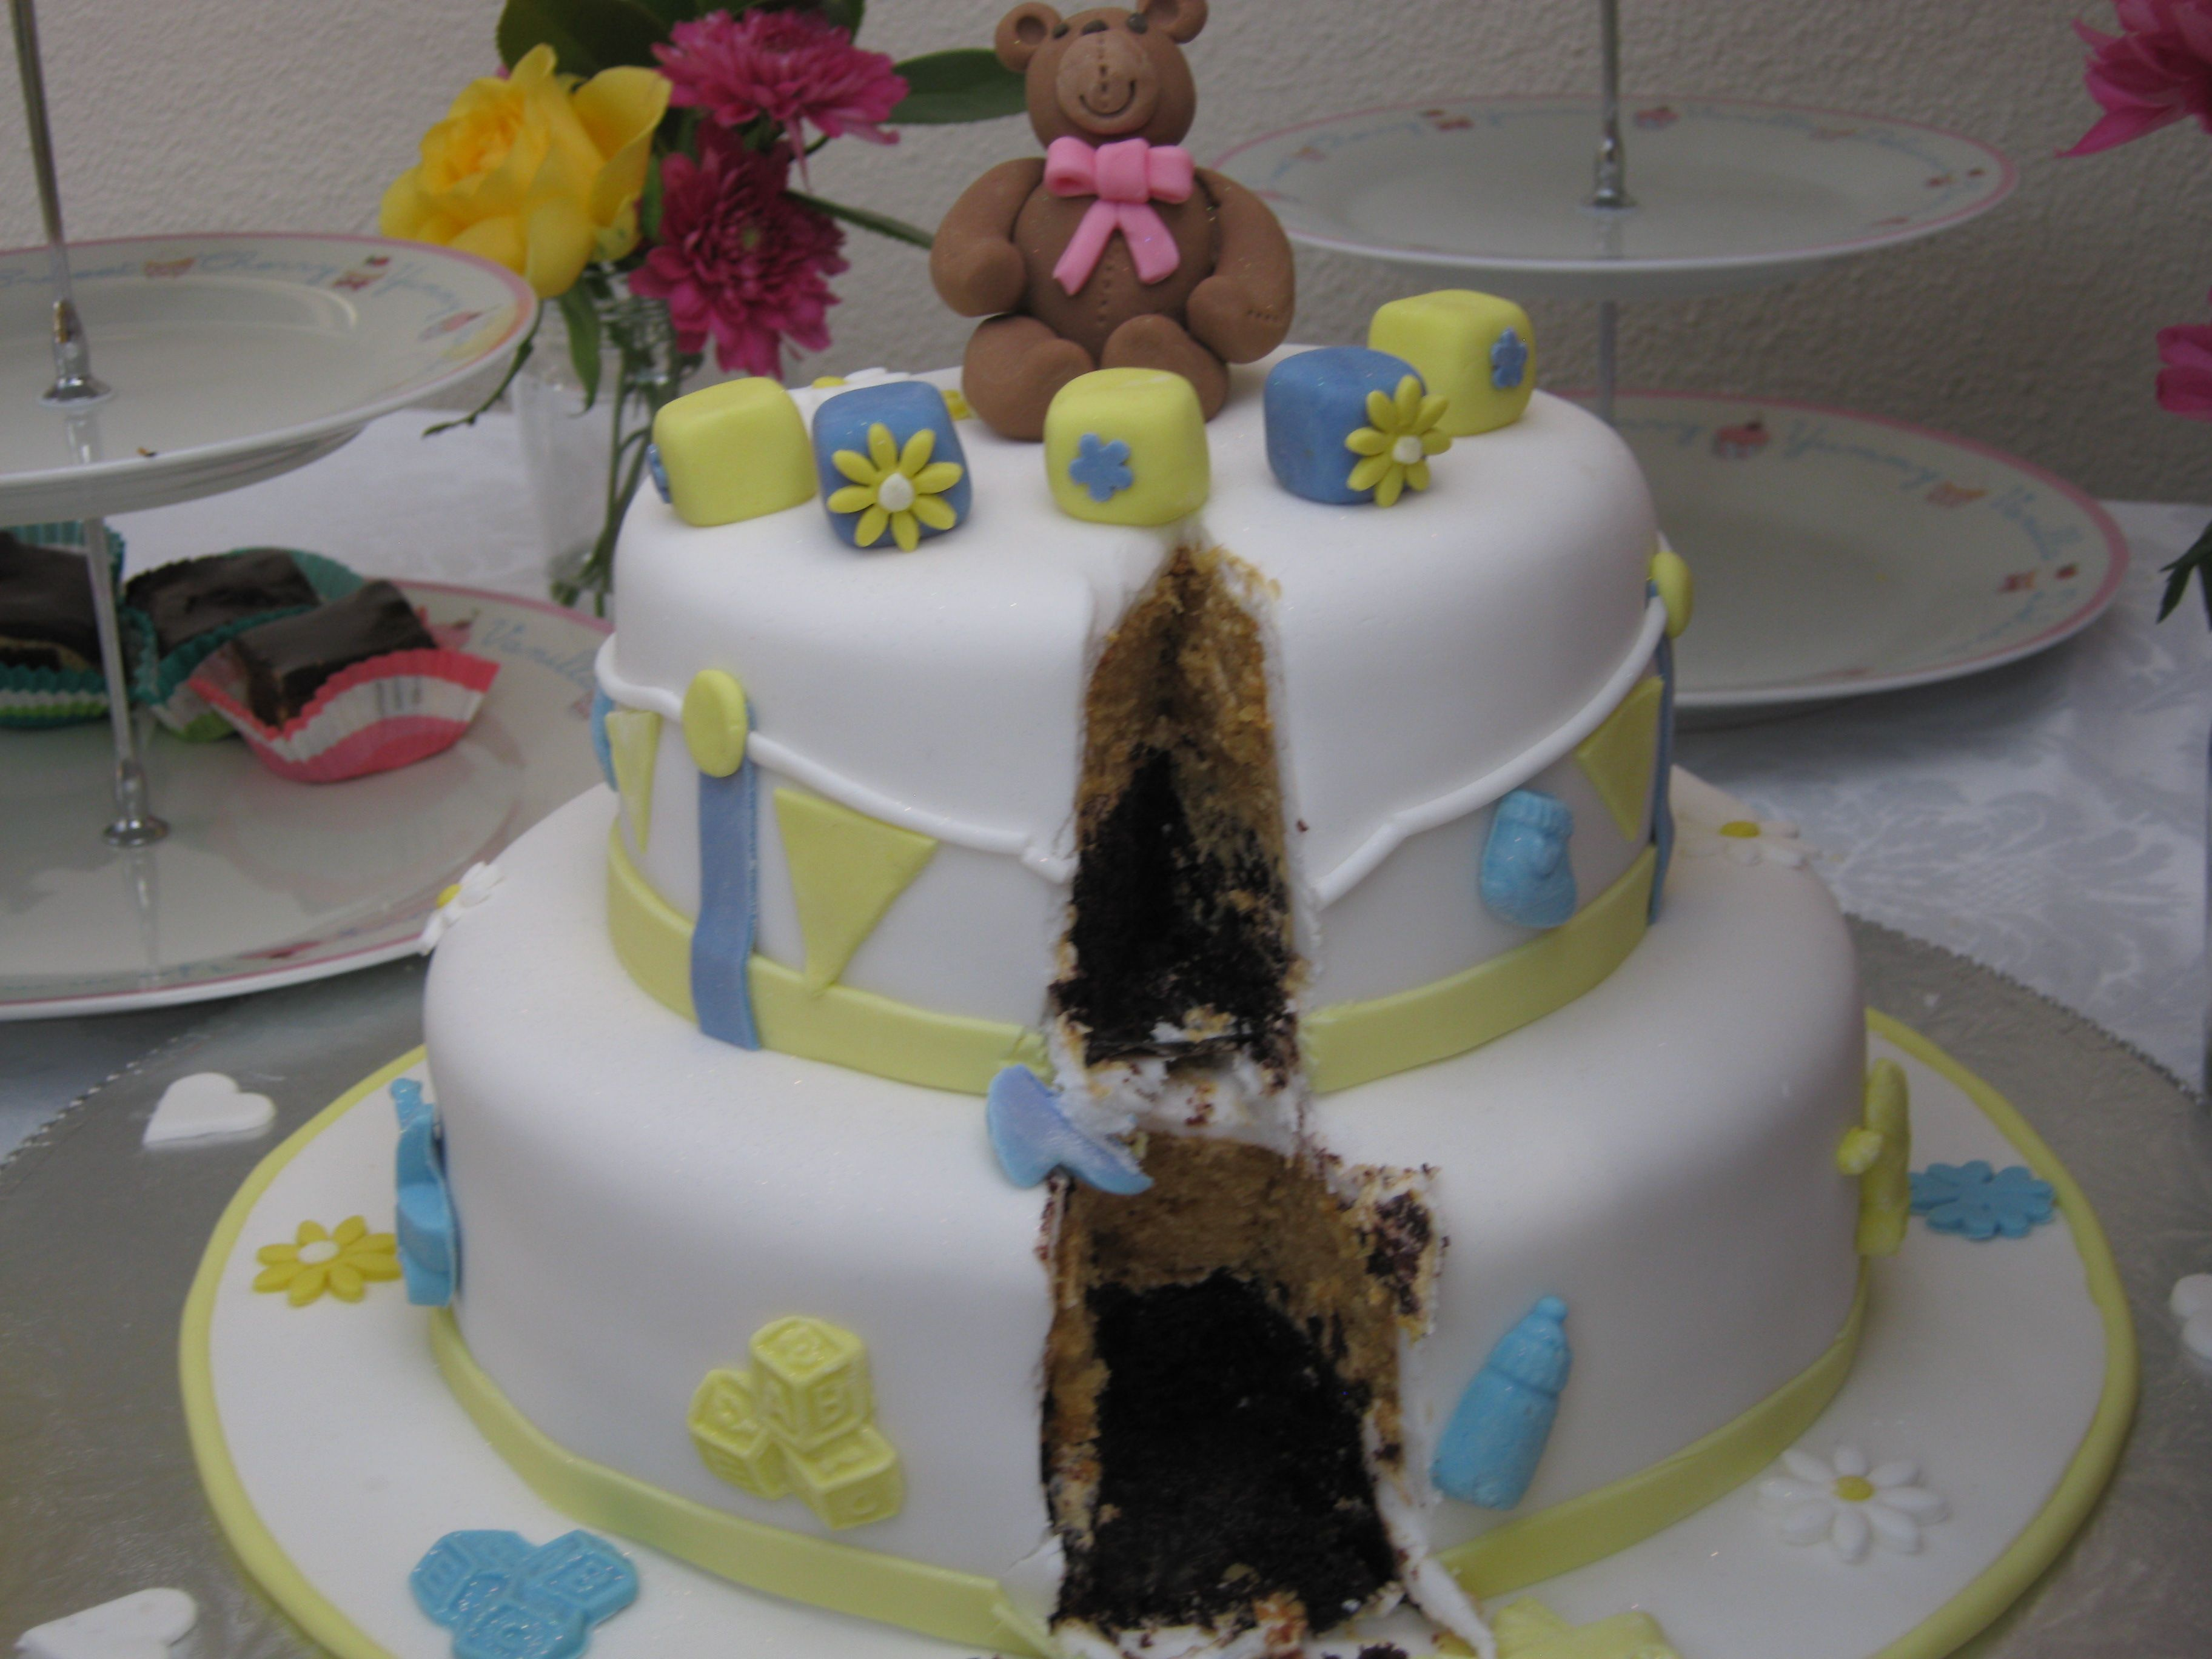 Gender reveal cake baby shower cake wwwfrescofoodsconz